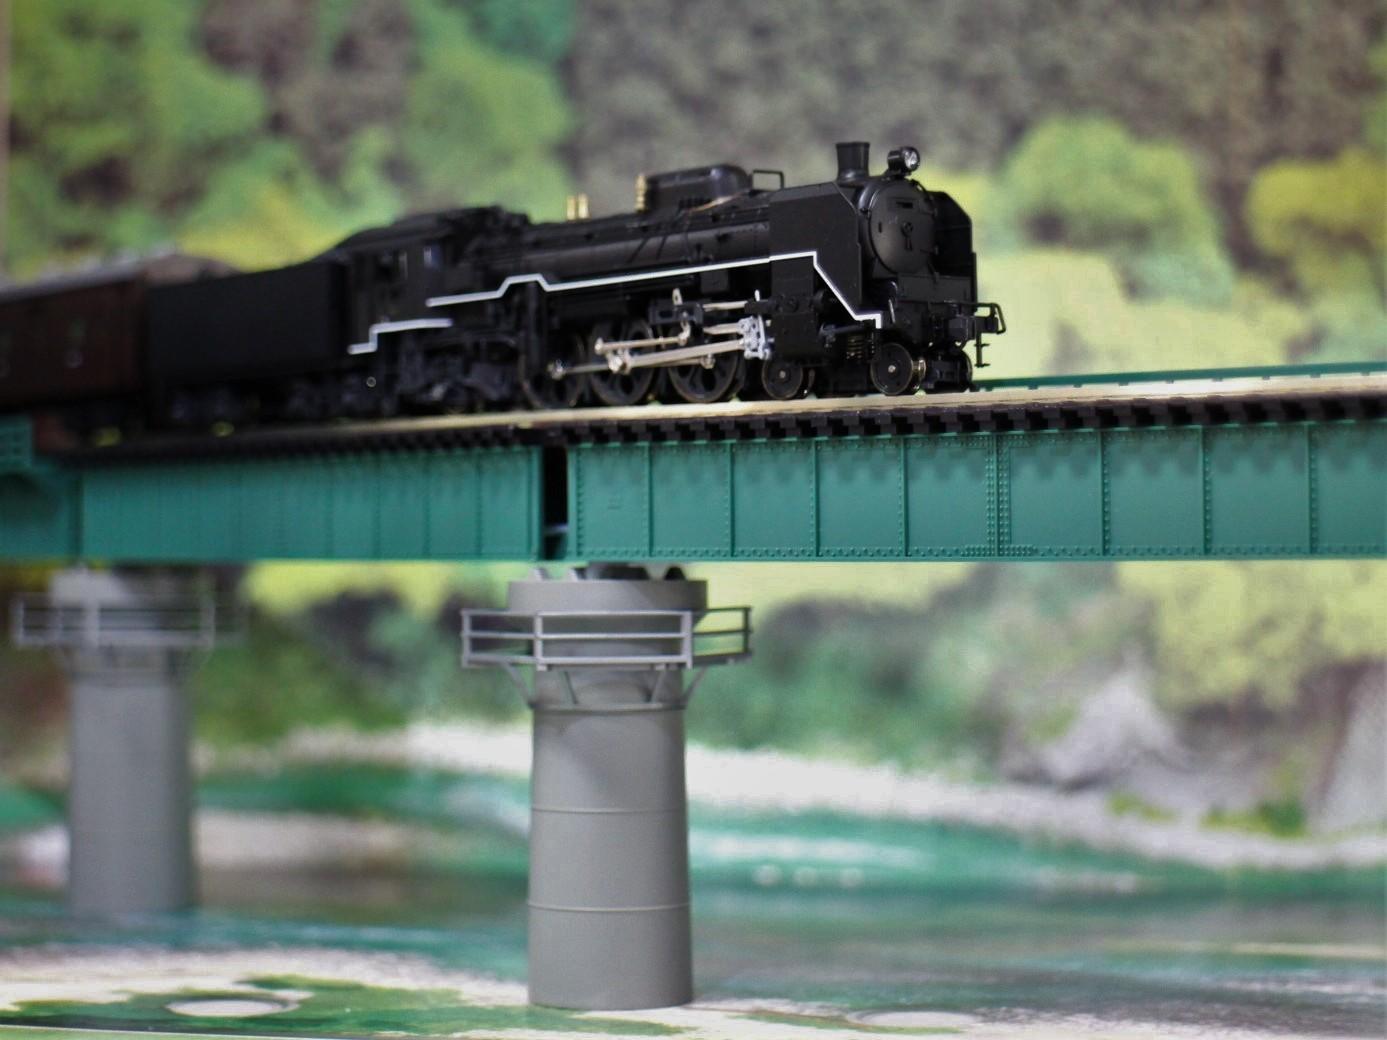 KATO のカーブ鉄橋セットを使い楽しんでみる!_a0149148_10485324.jpg